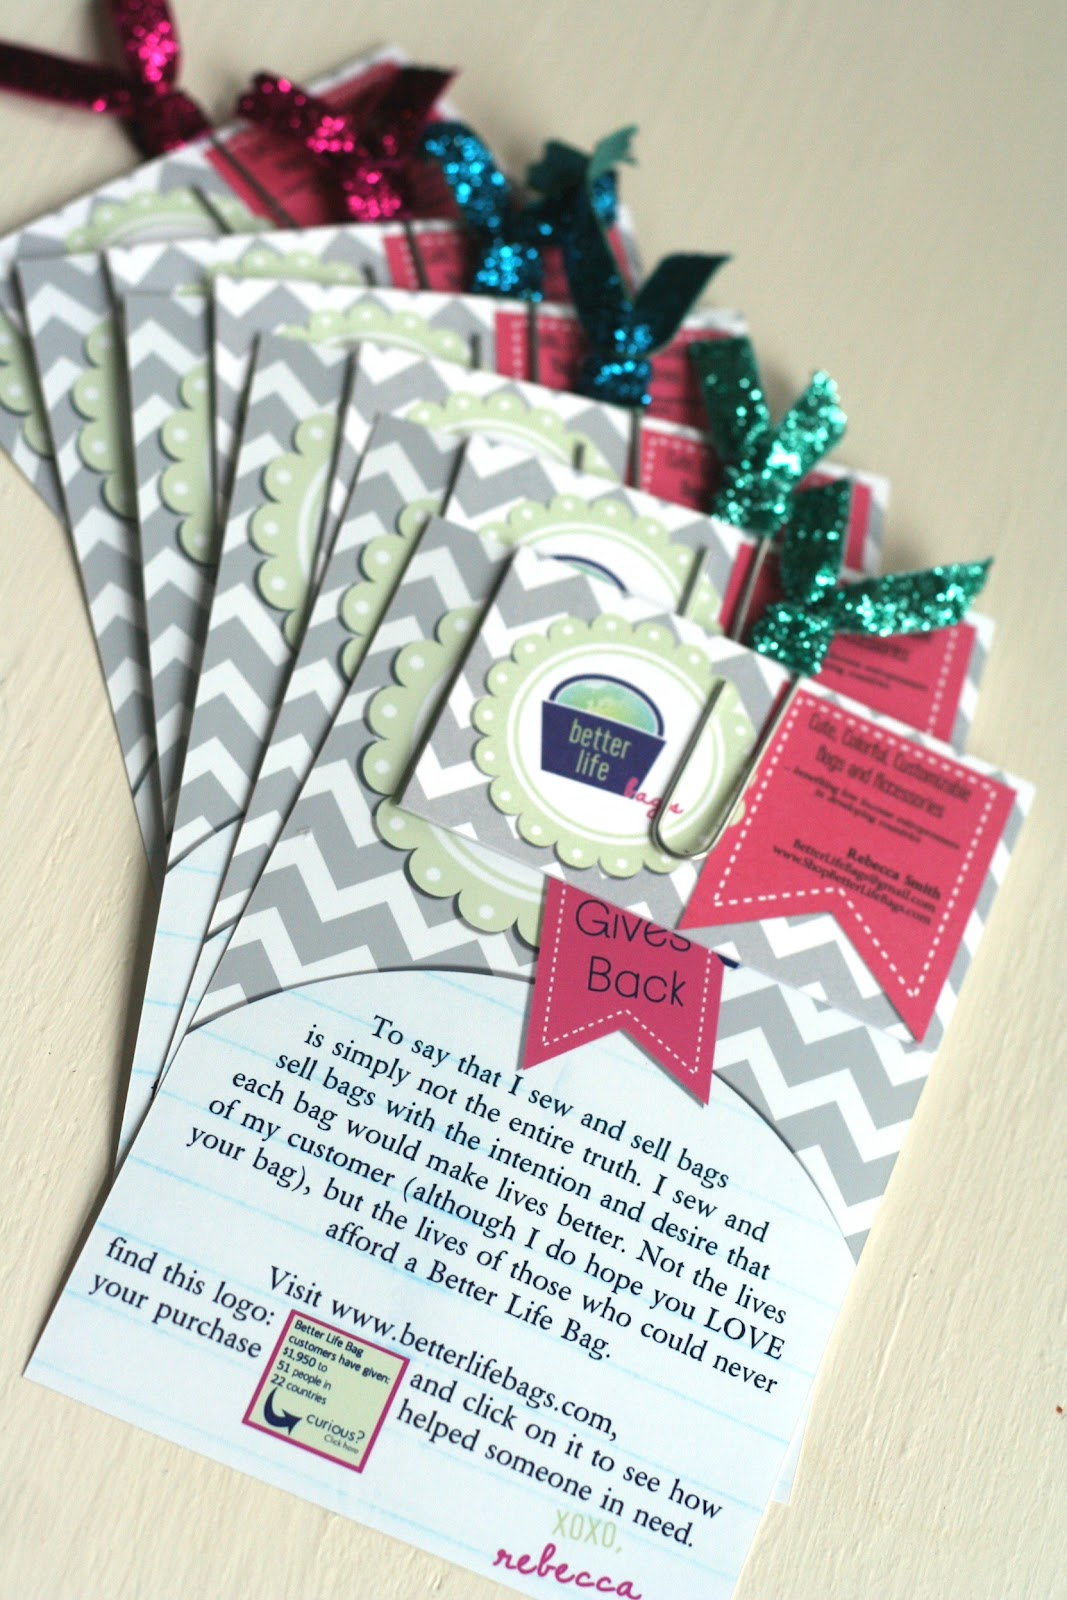 Better Life Blog Custom Business Cards from Vistaprint